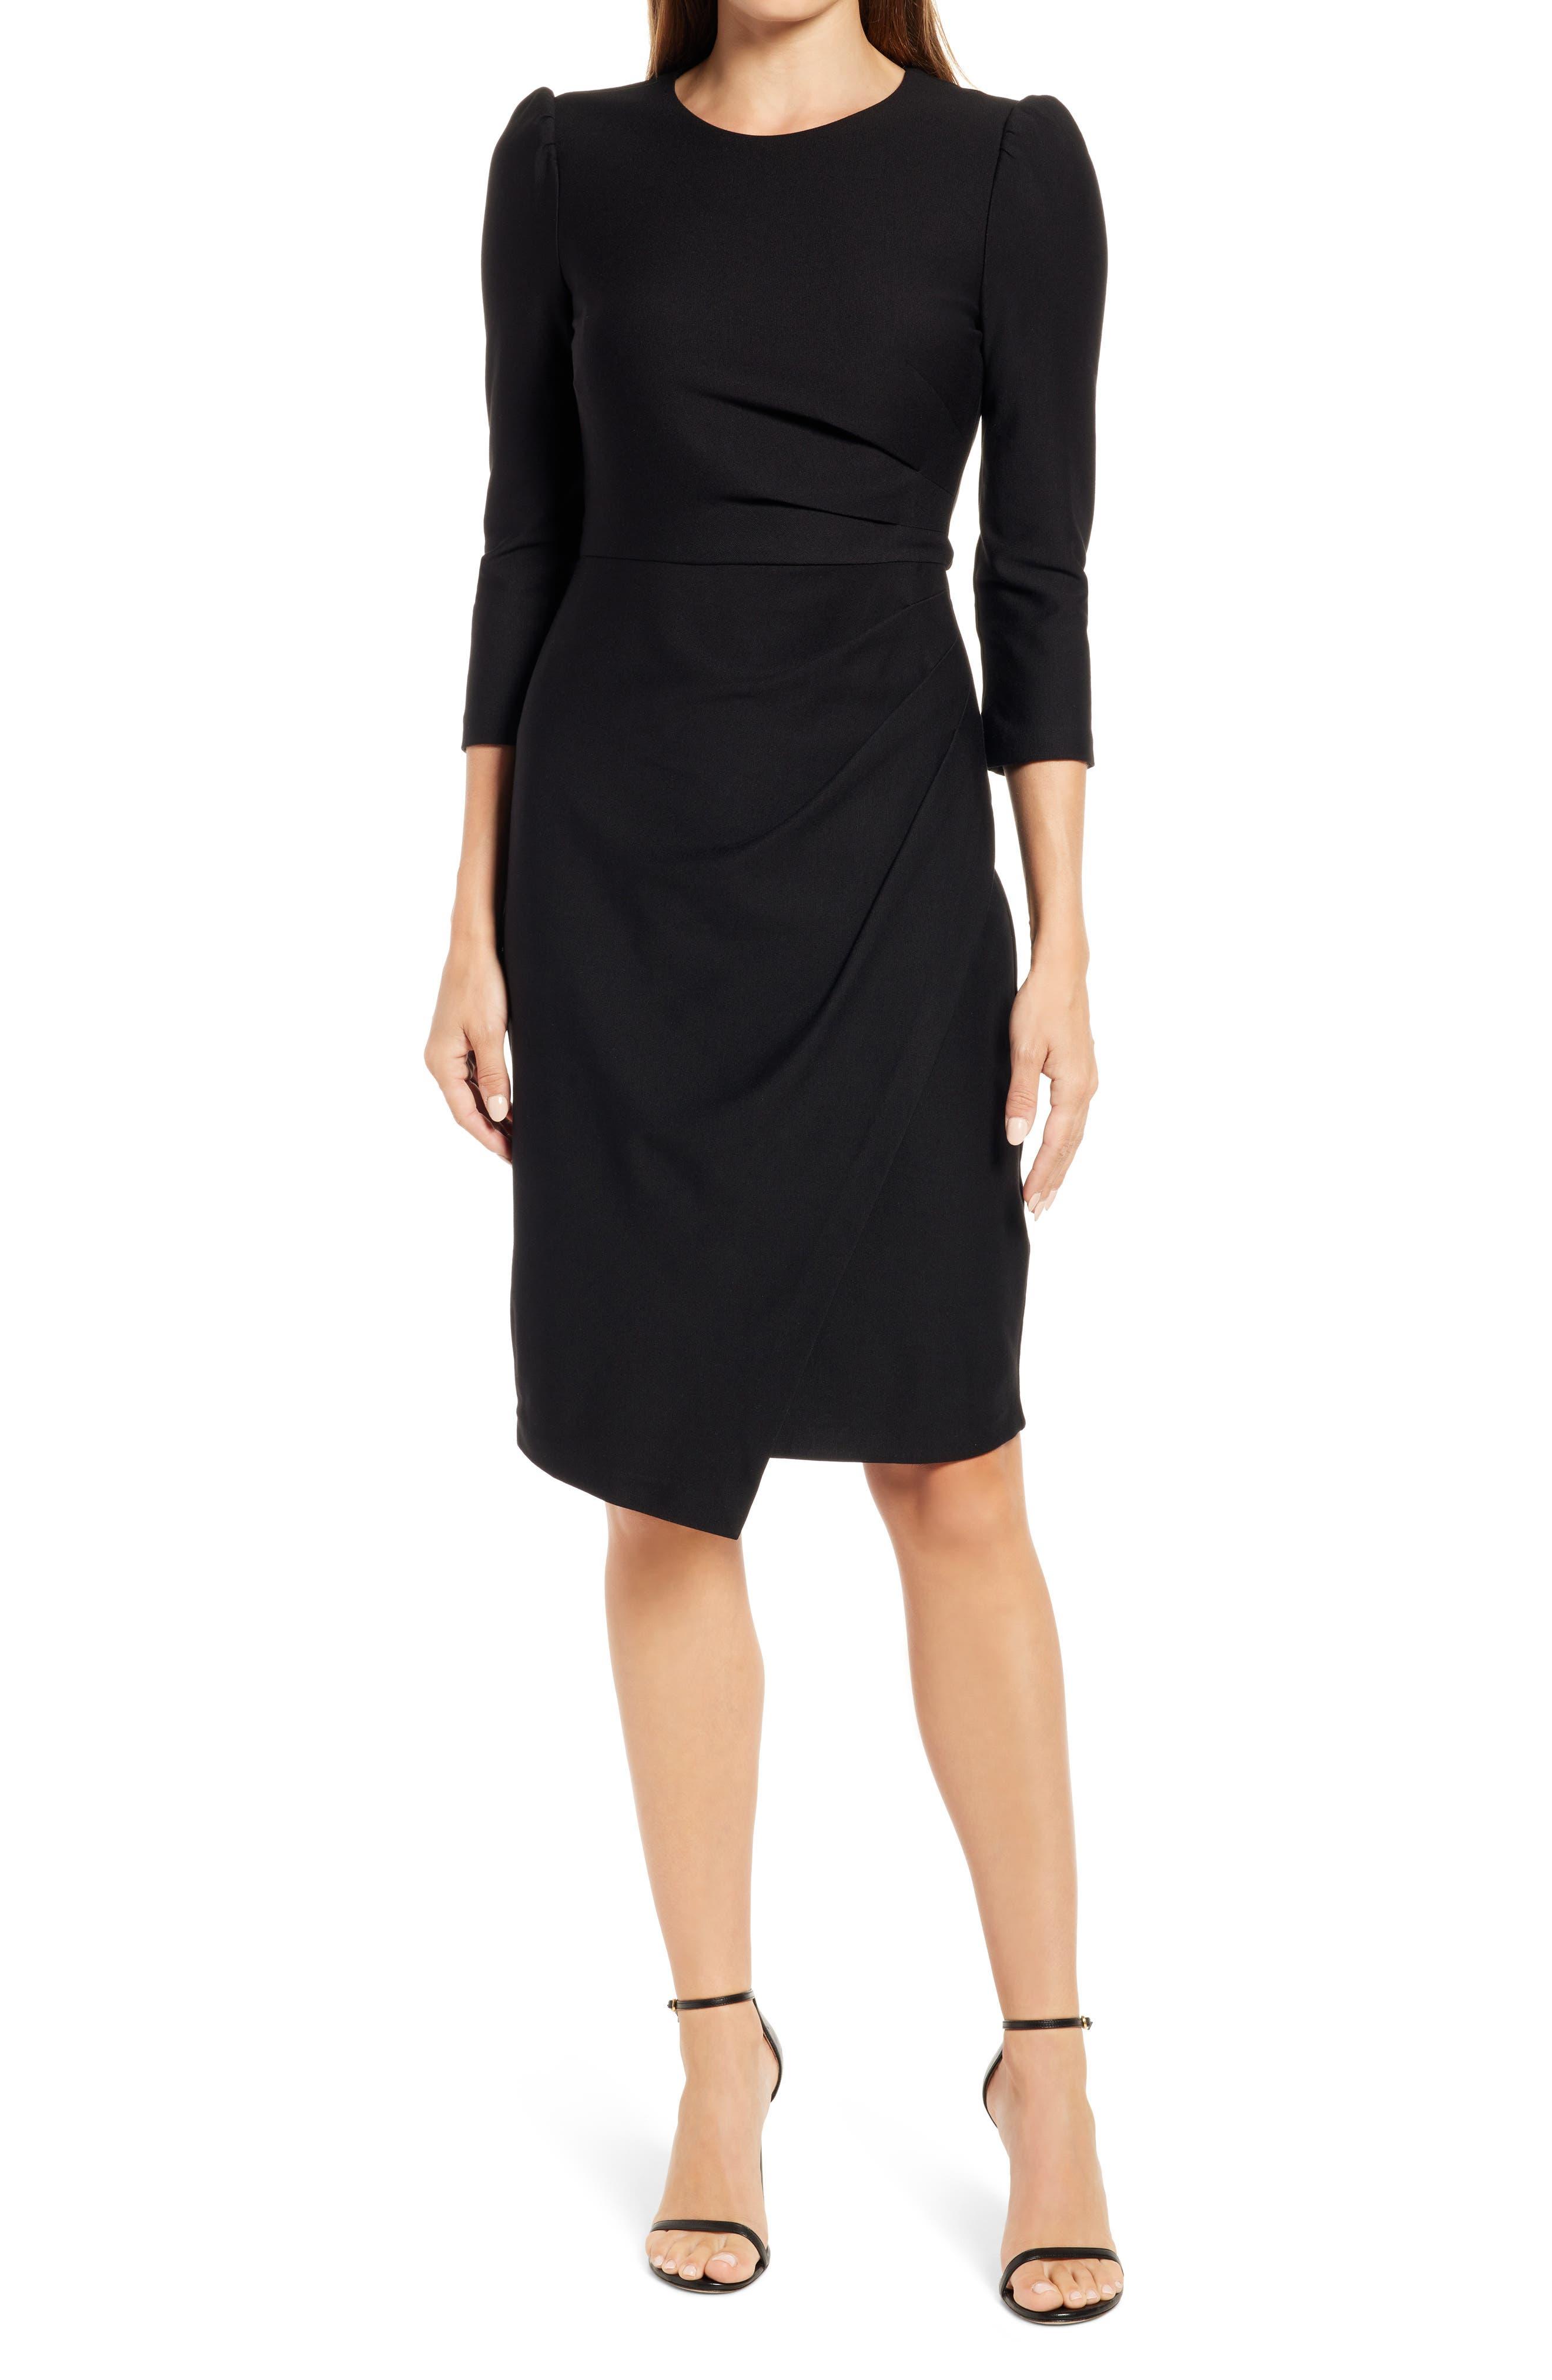 Pleat Asymmetric Long Sleeve Sheath Dress